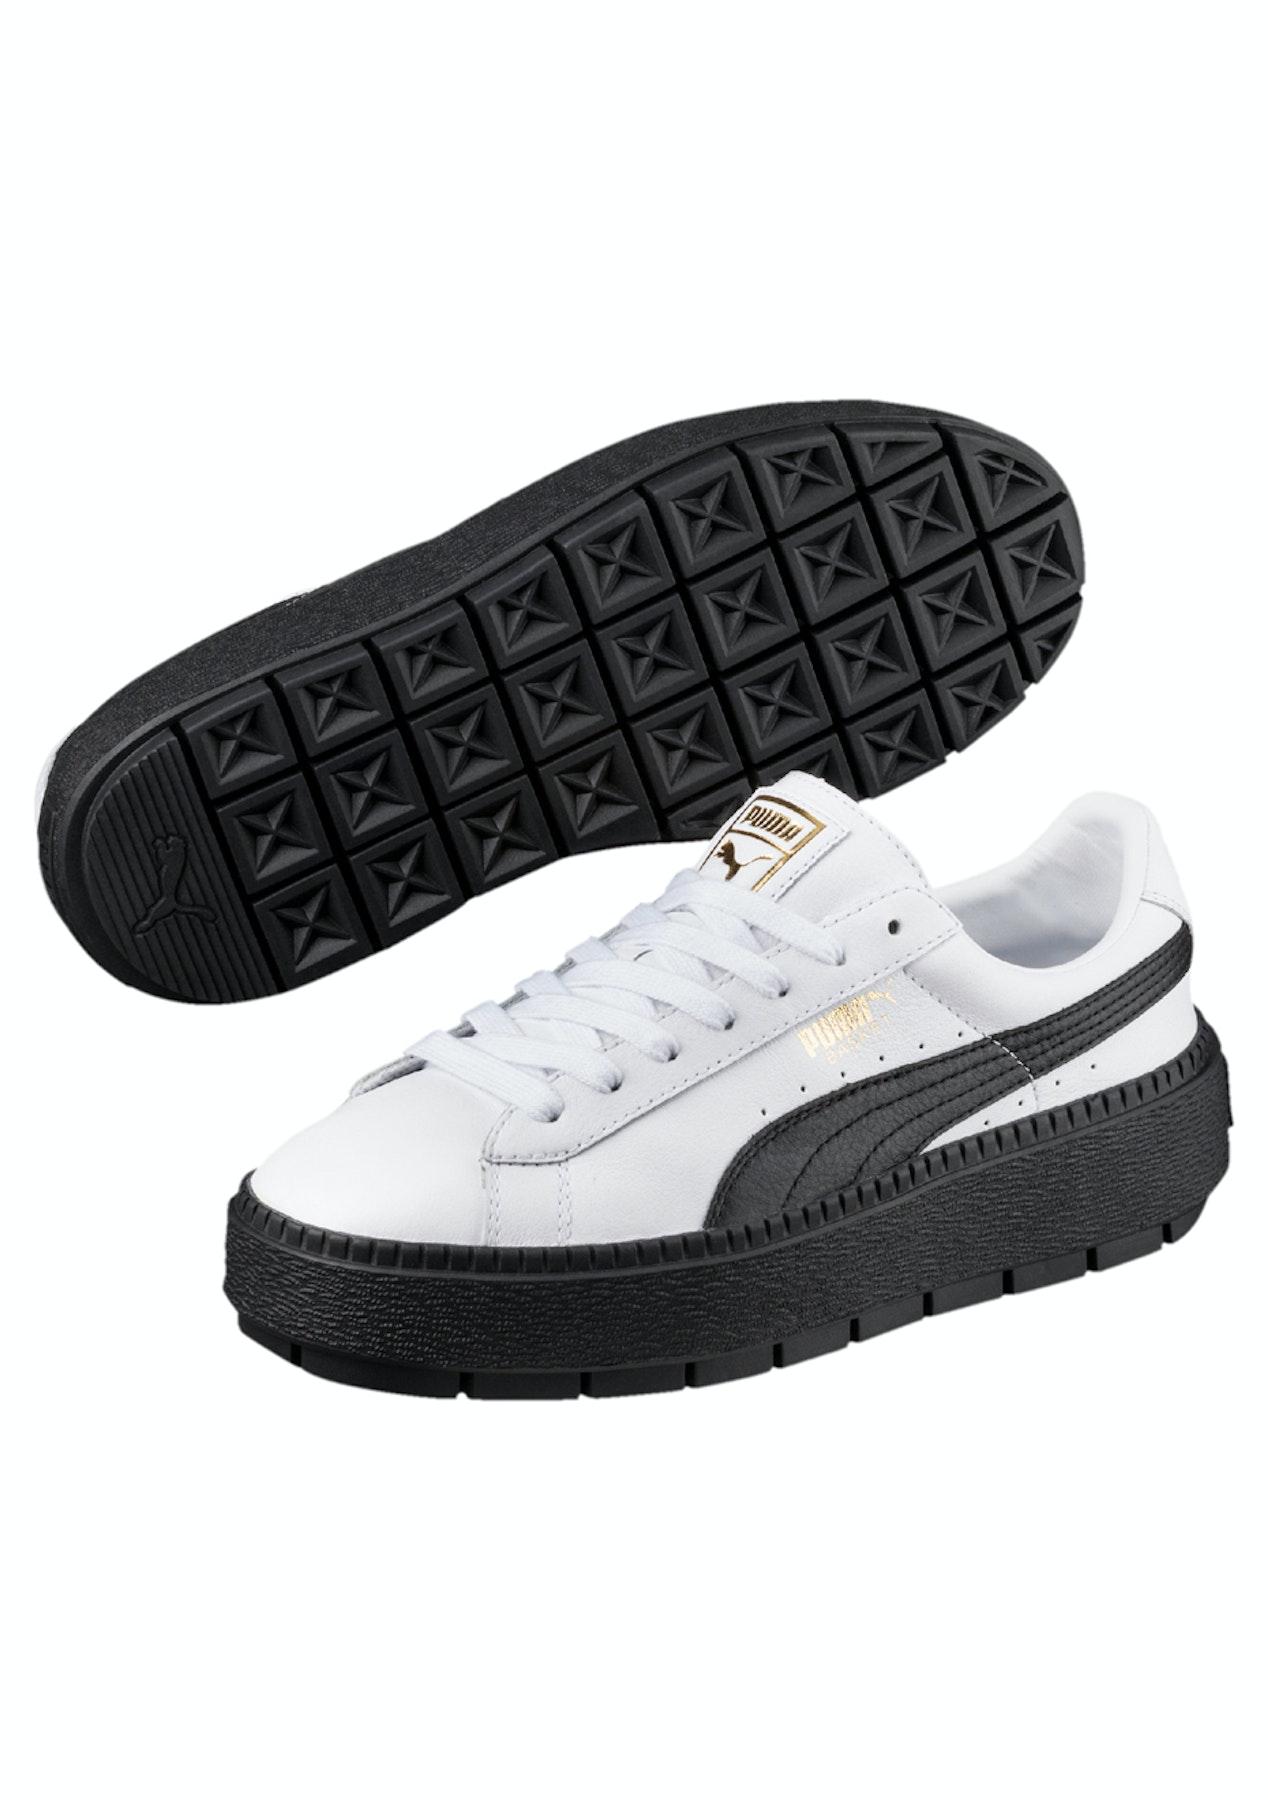 a2be3a6f31a7c8 Puma Womens - Basket Platform Trace - White - Black - Massive Puma Discounts  - Onceit